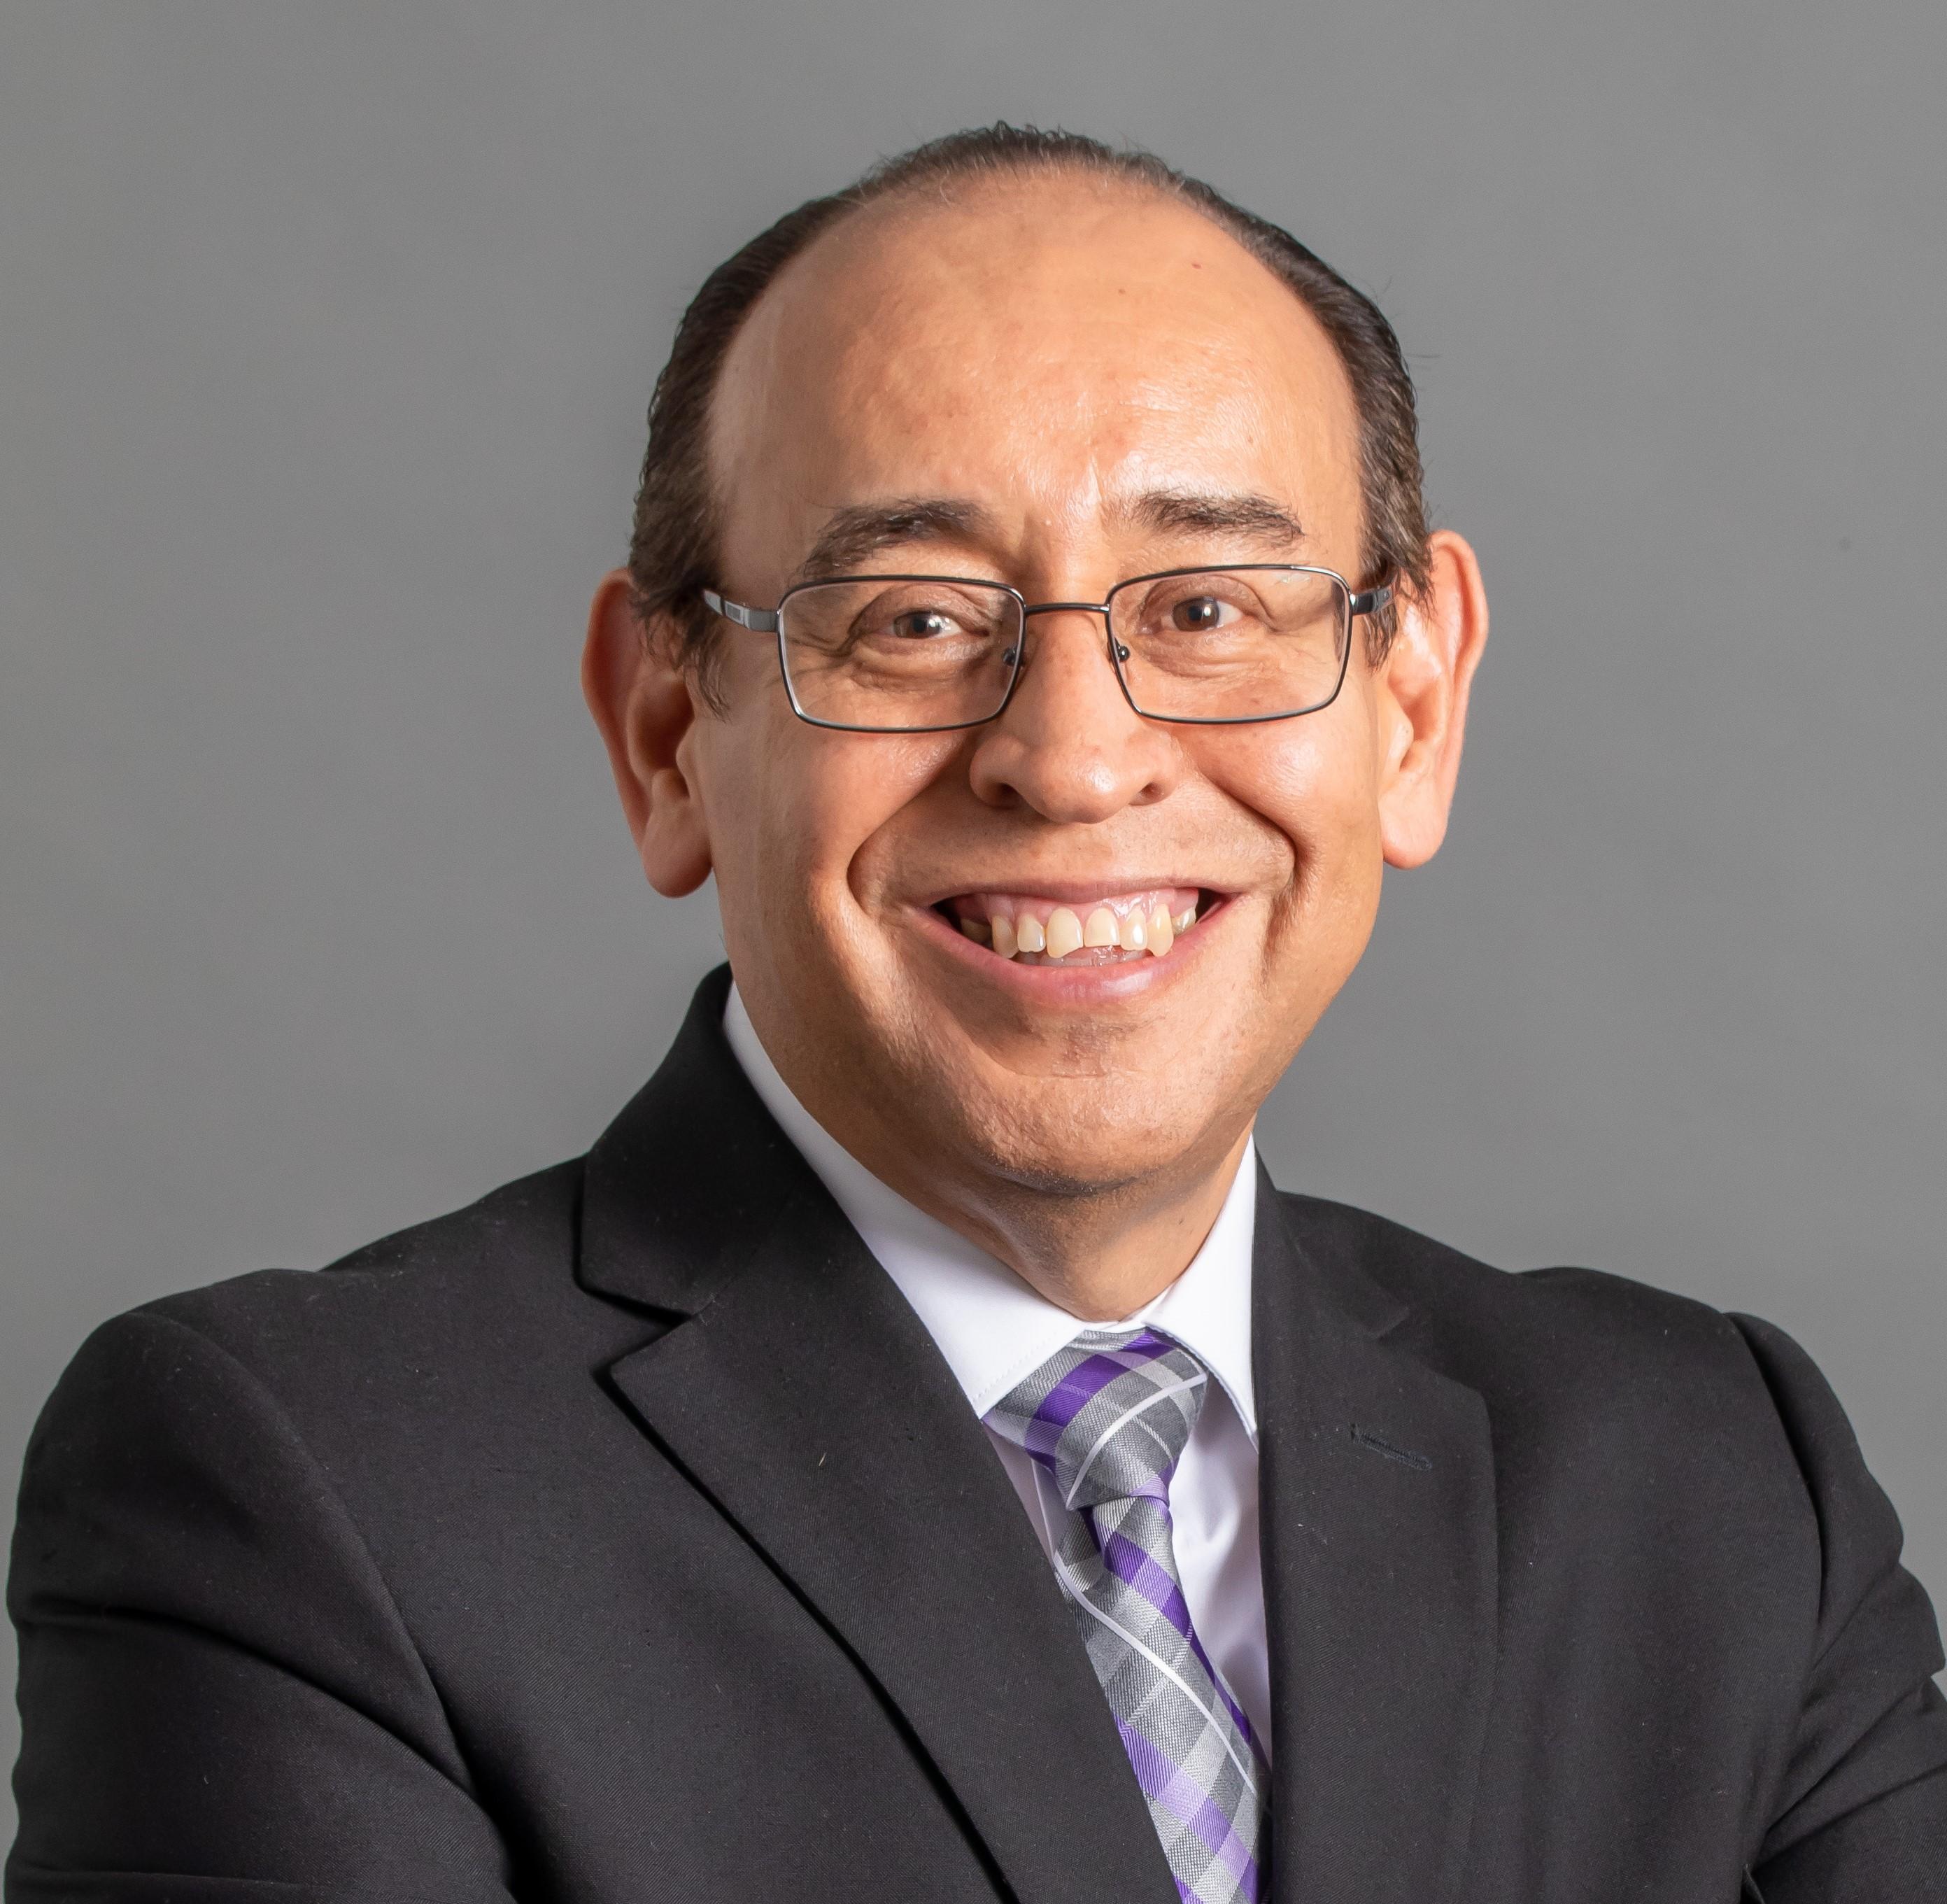 Picture of José Luis Callejas Reyes